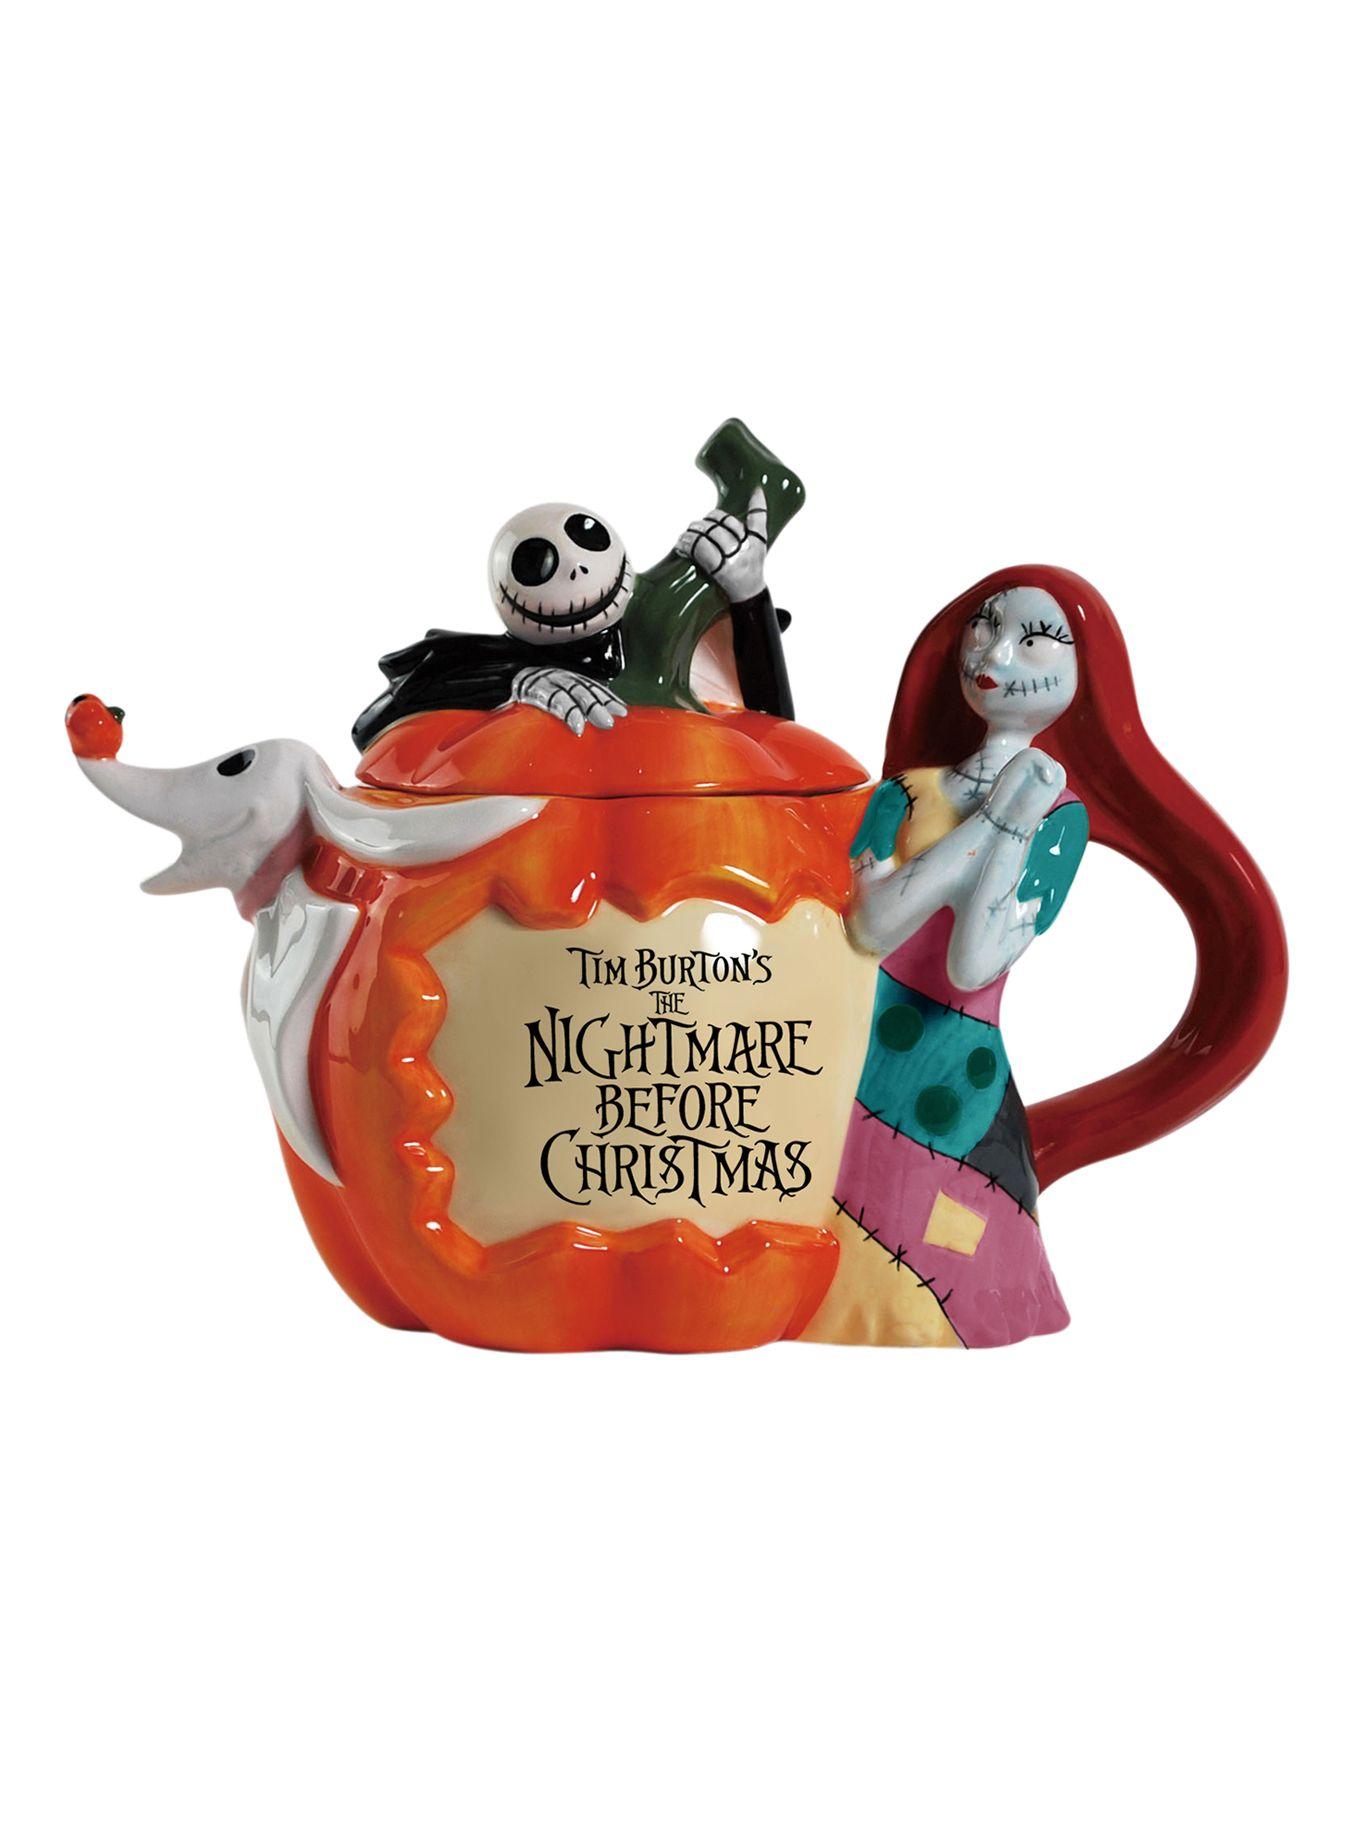 The Nightmare Before Christmas Pumpkin Teapot | Hot Topic ...